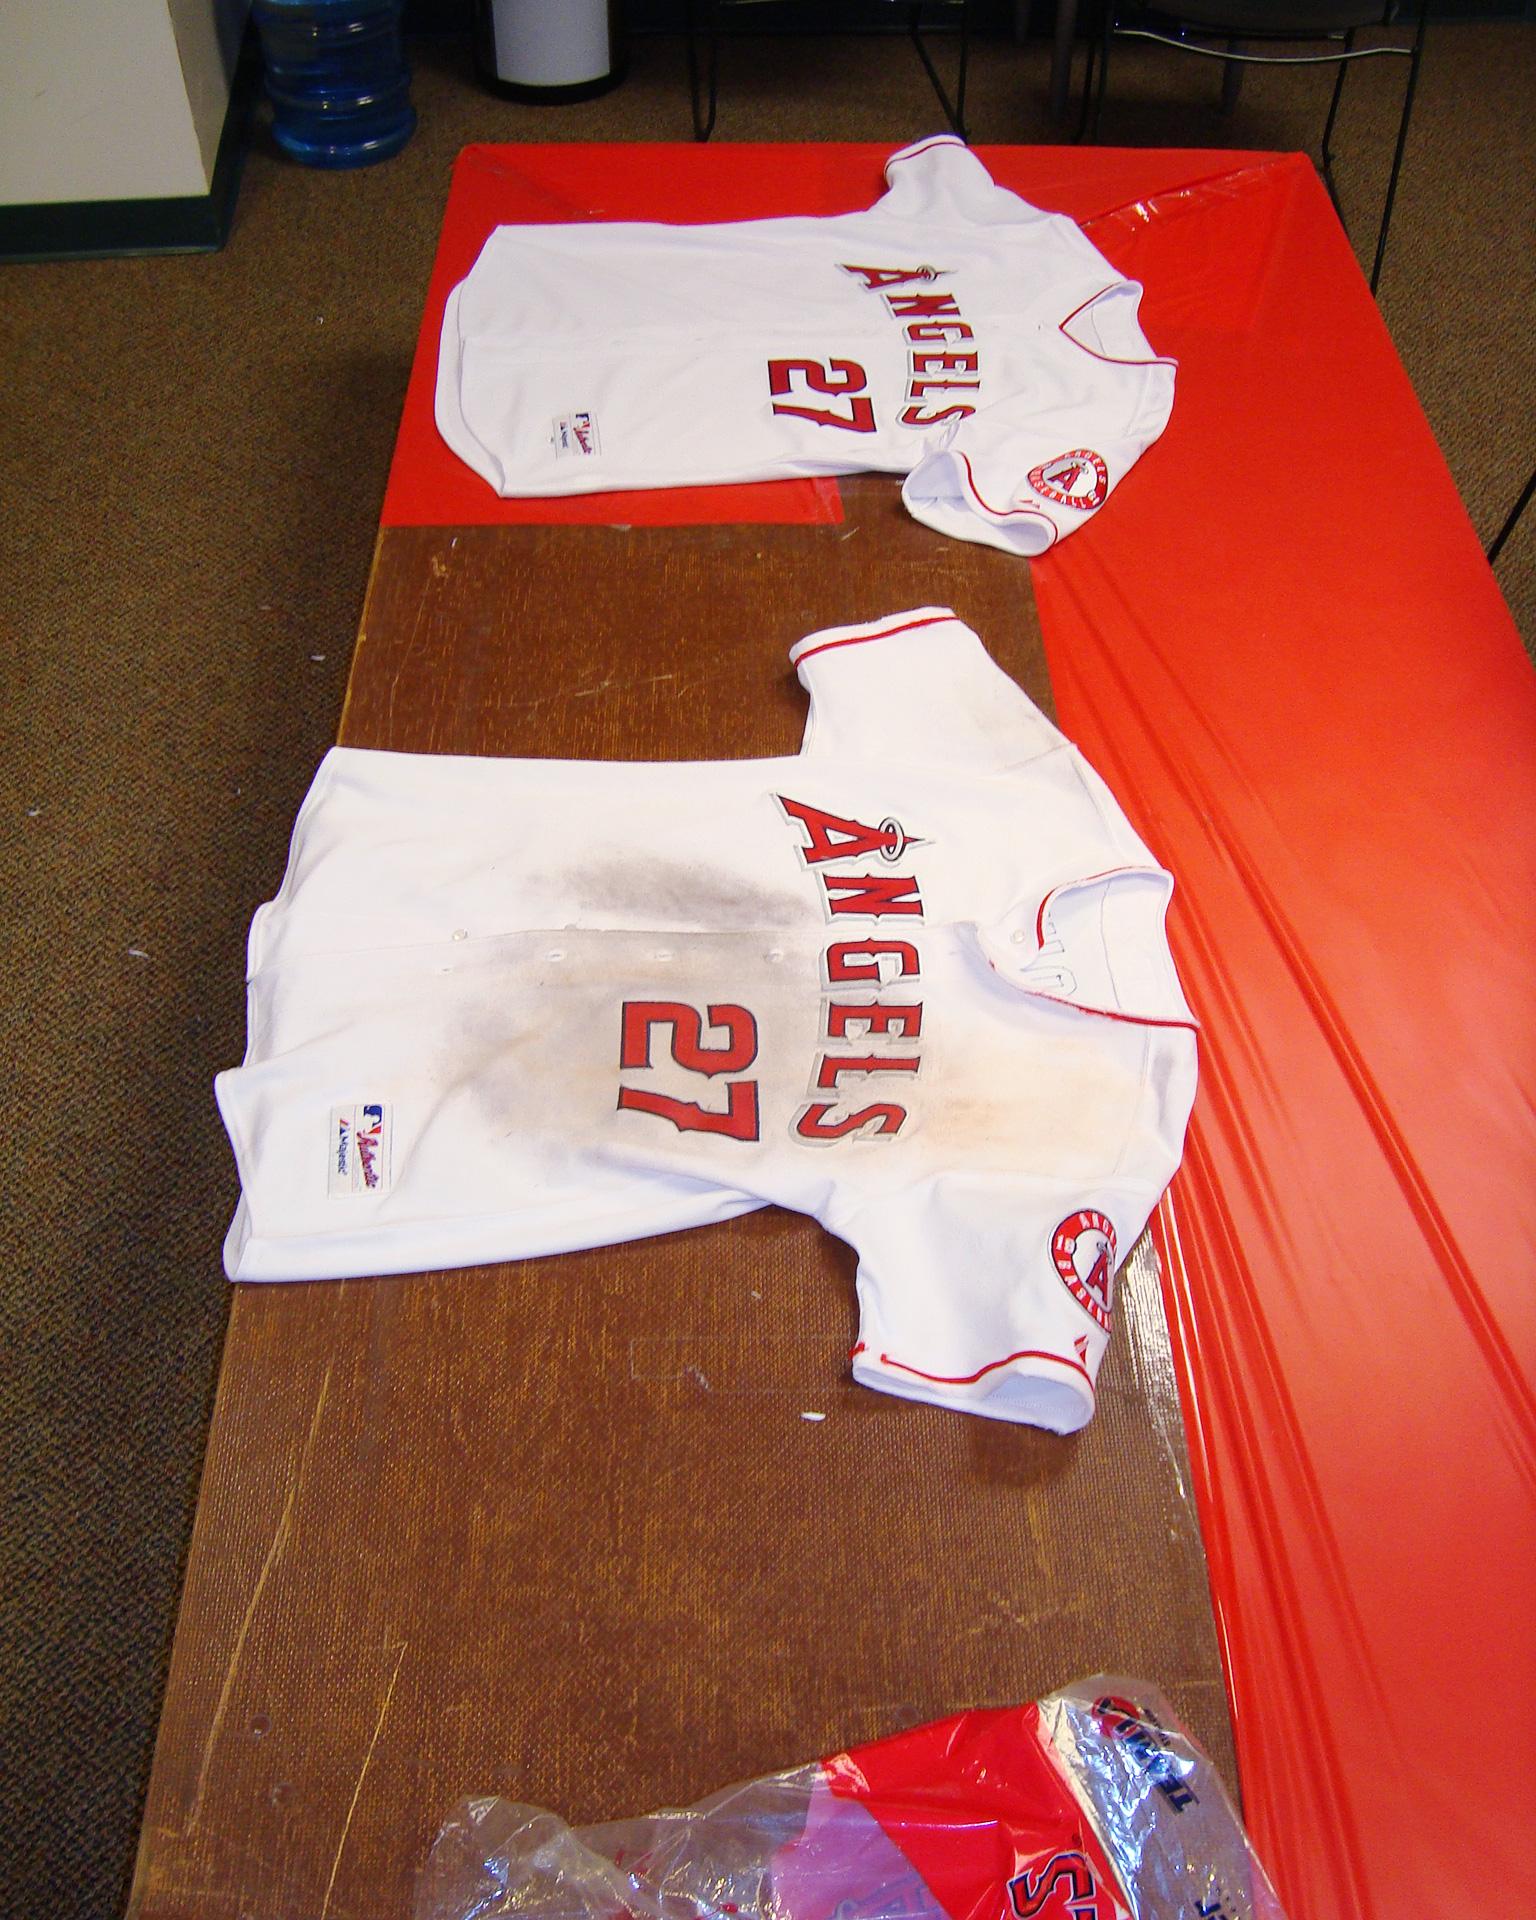 Angels jerseys